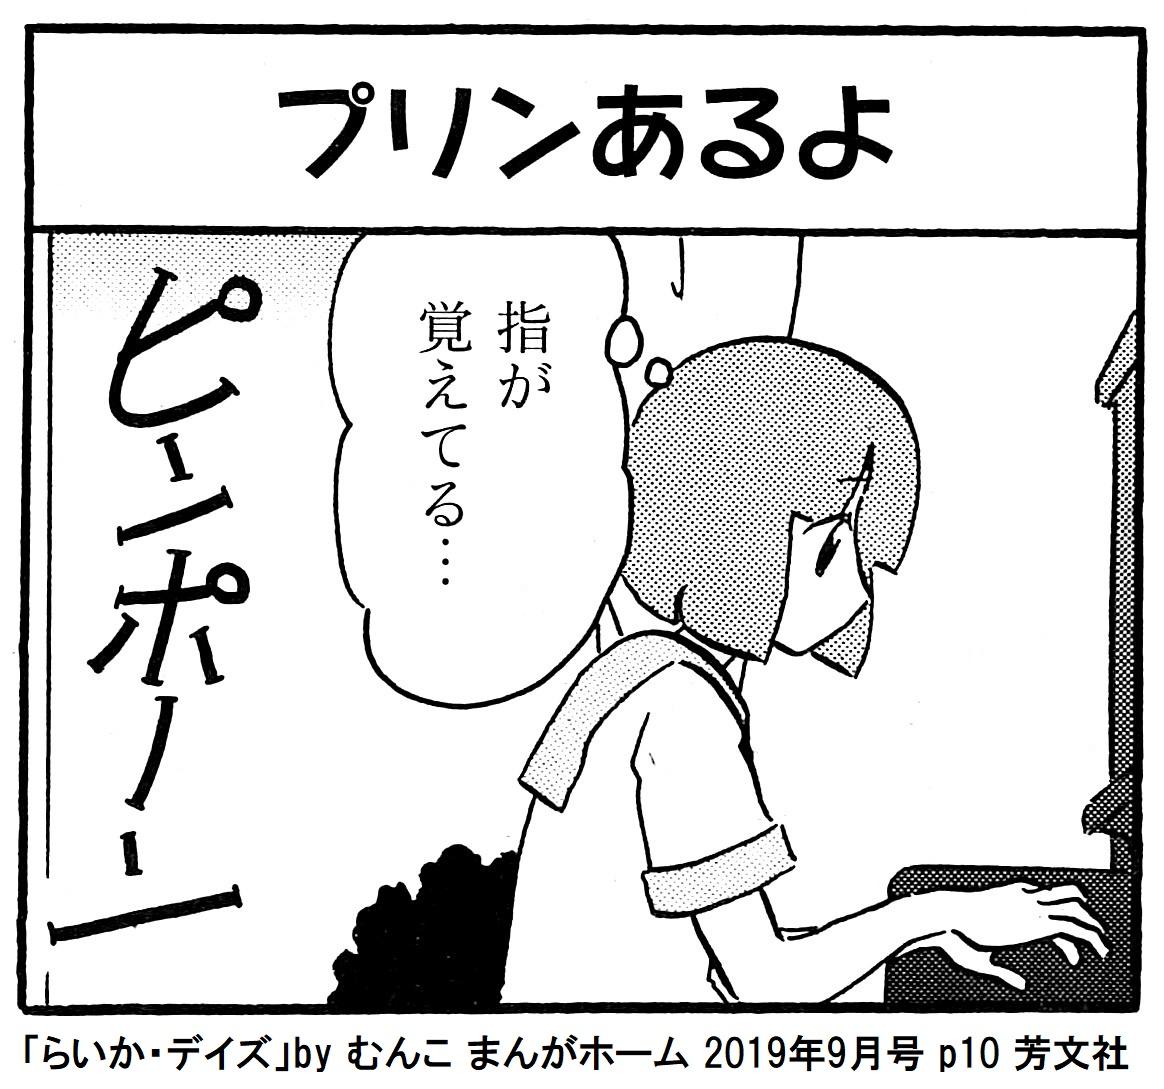 f:id:tanaka-minoru-fake:20190804230630j:plain